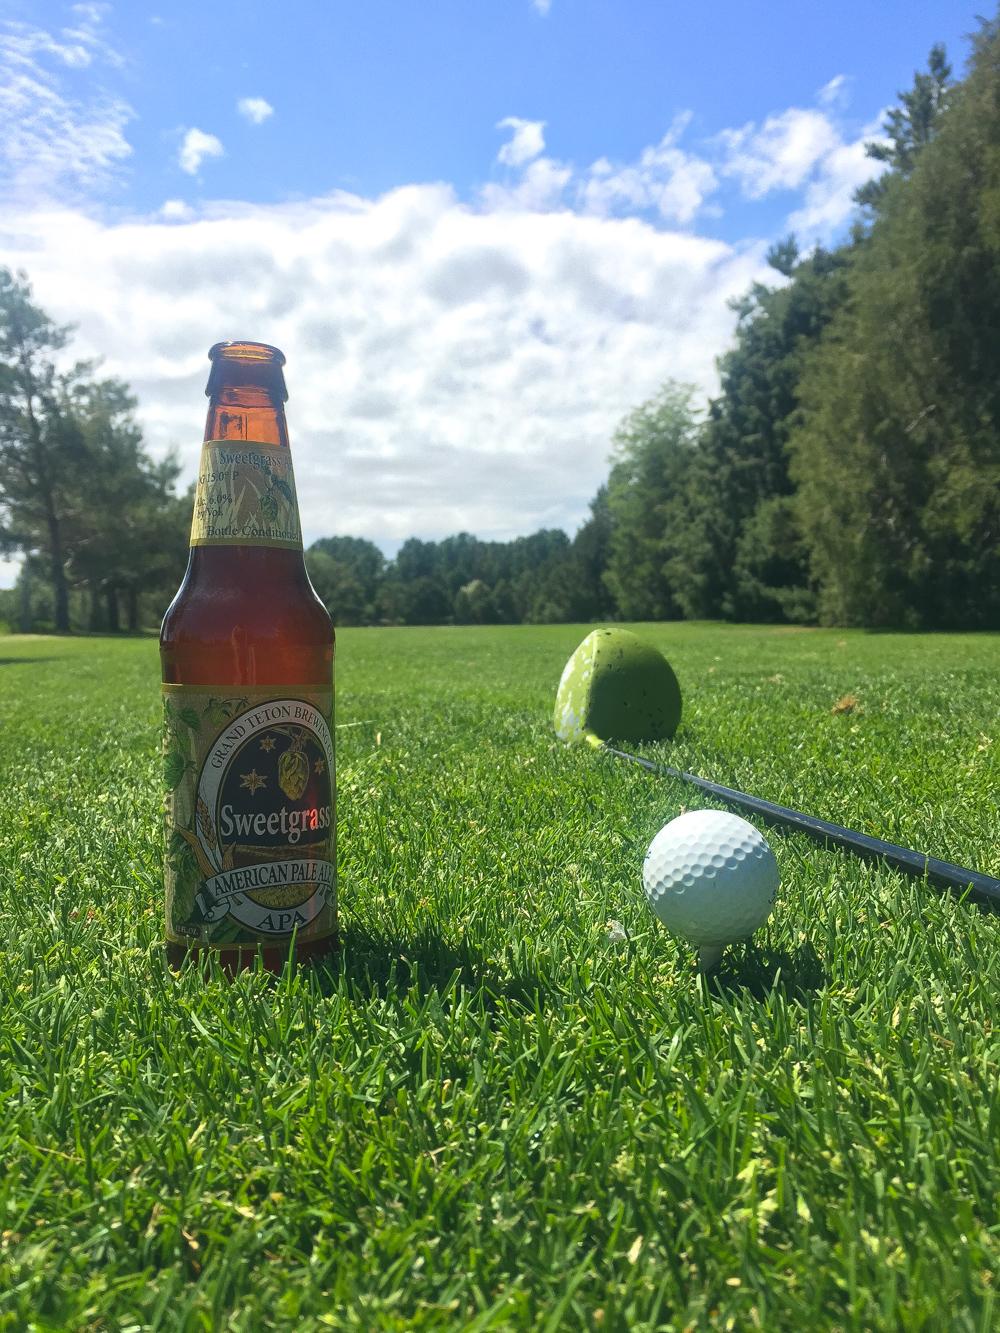 Heise Golf in Ririe, ID